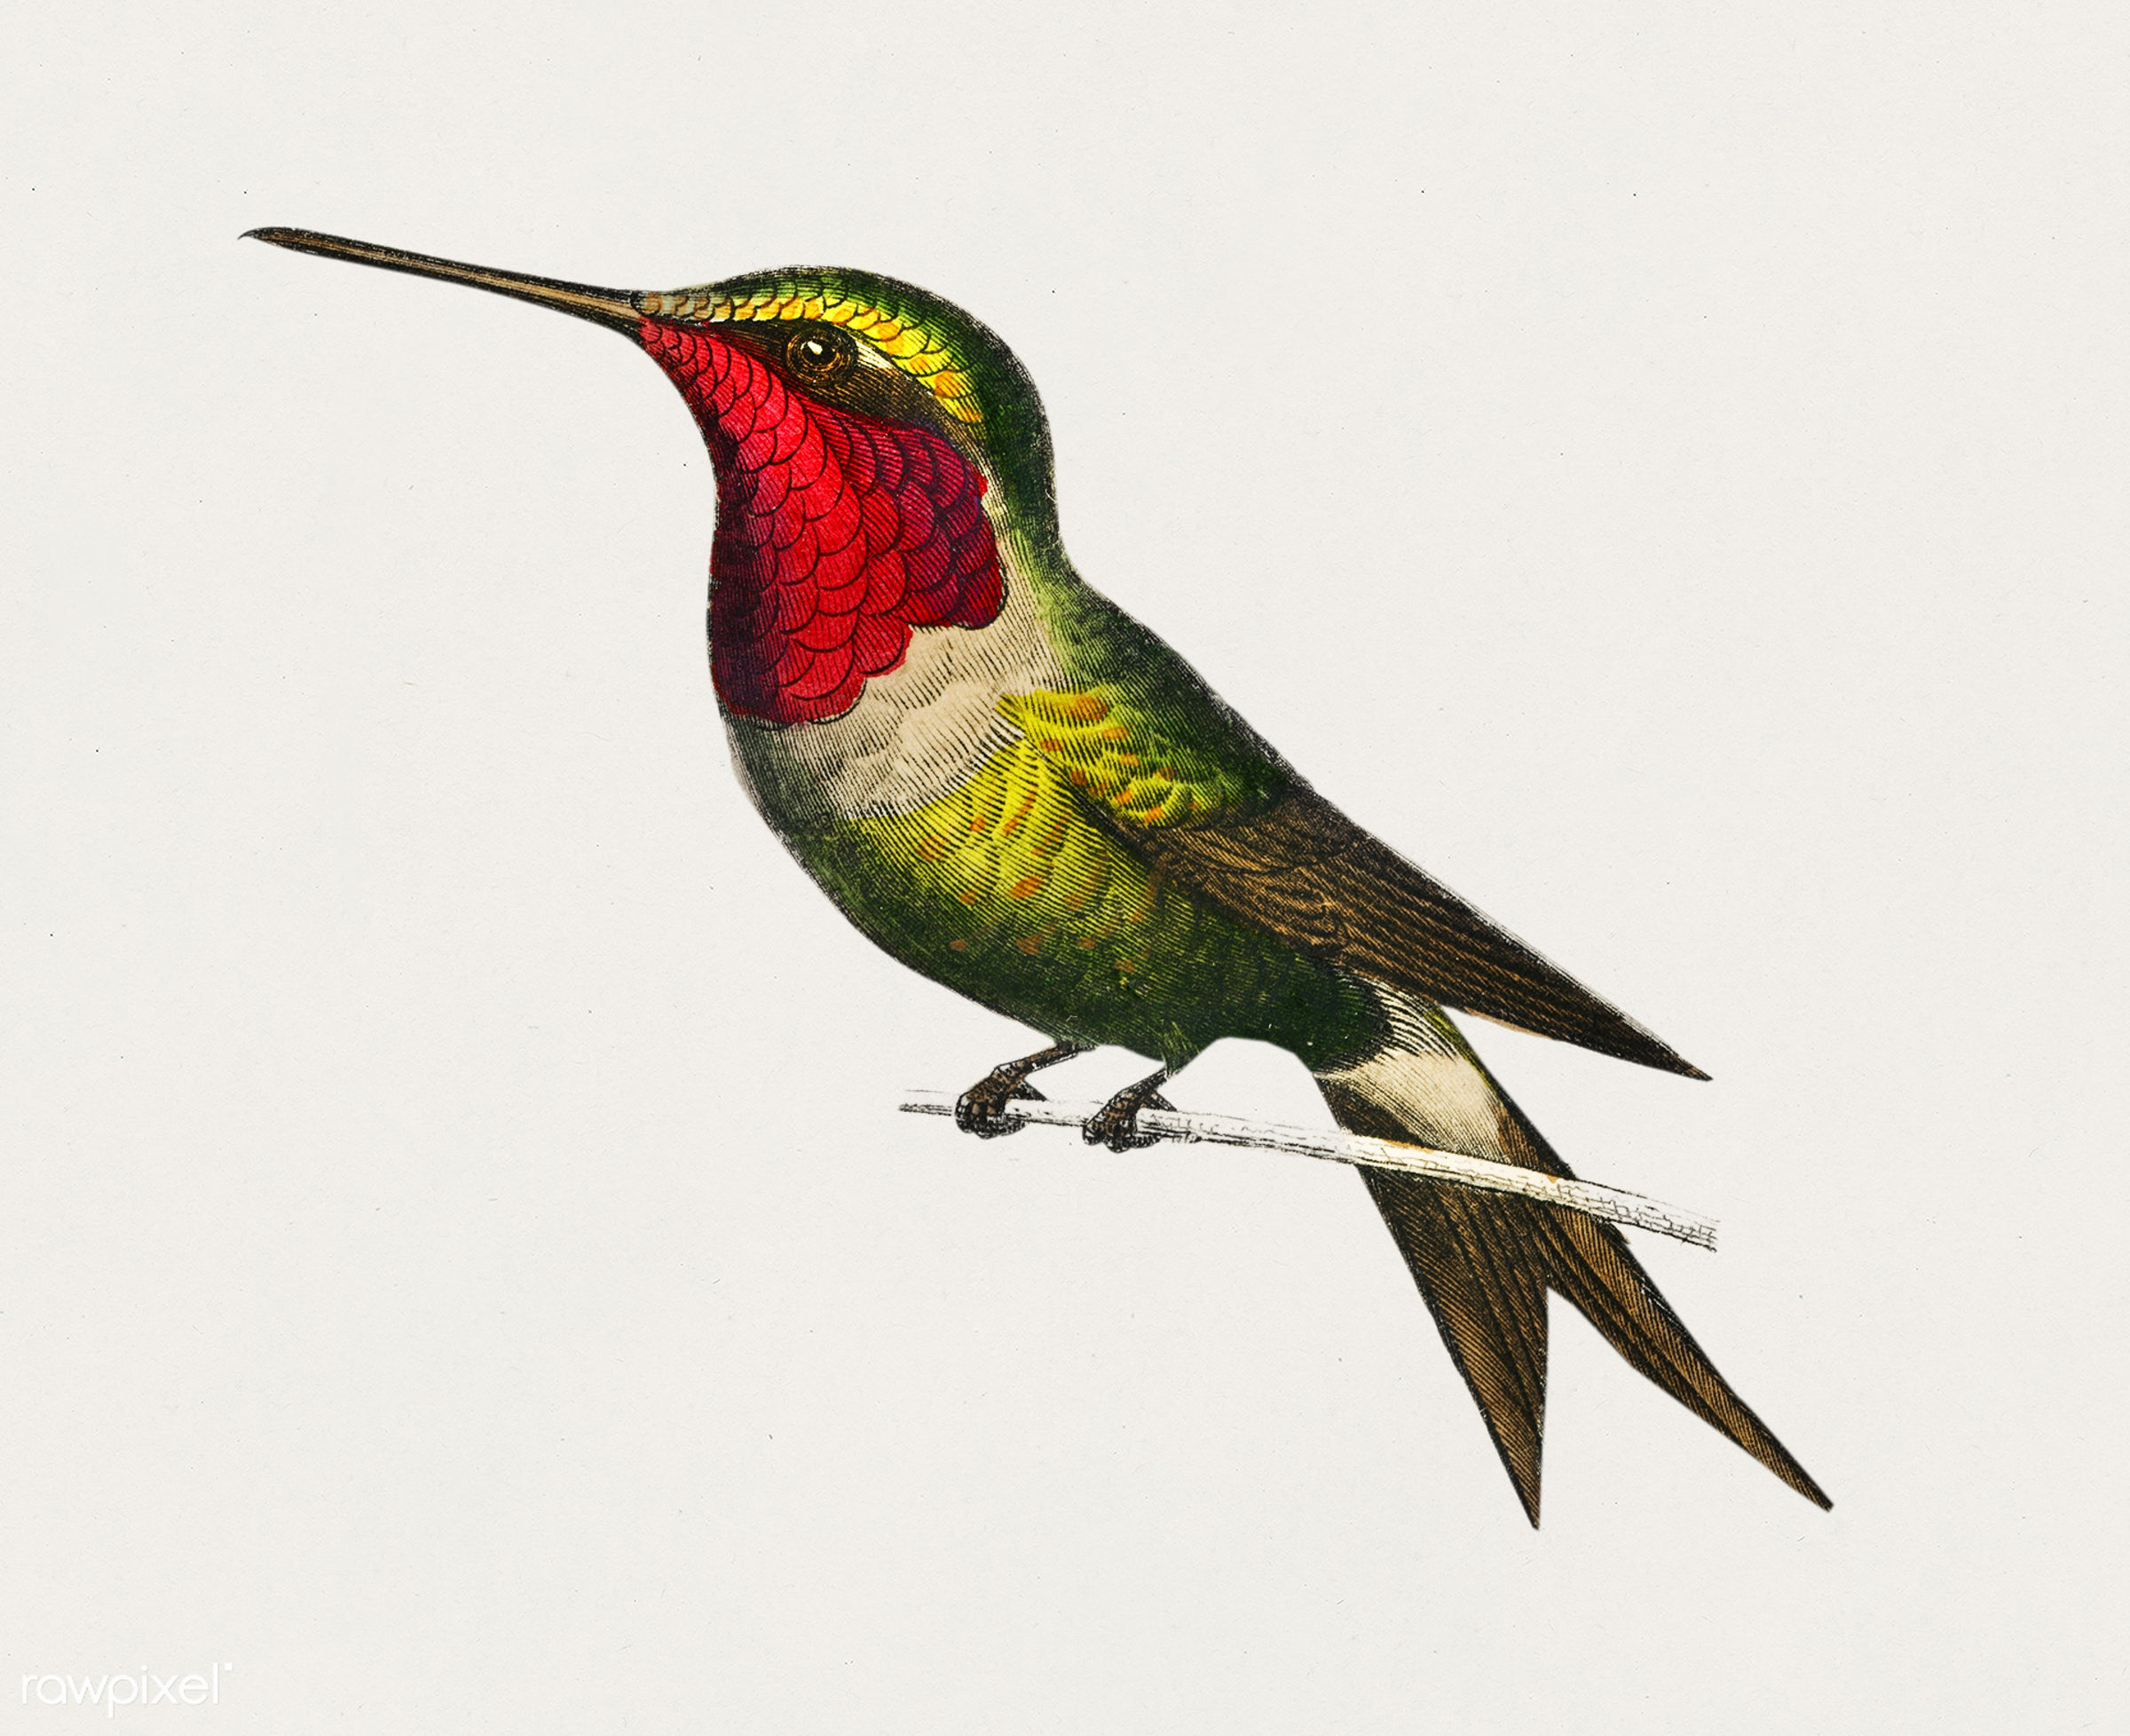 Amethyst Woodestar (Oiseau-Mouche Amethyste) illustrated by Charles Dessalines D' Orbigny (1806-1876). Digitally...